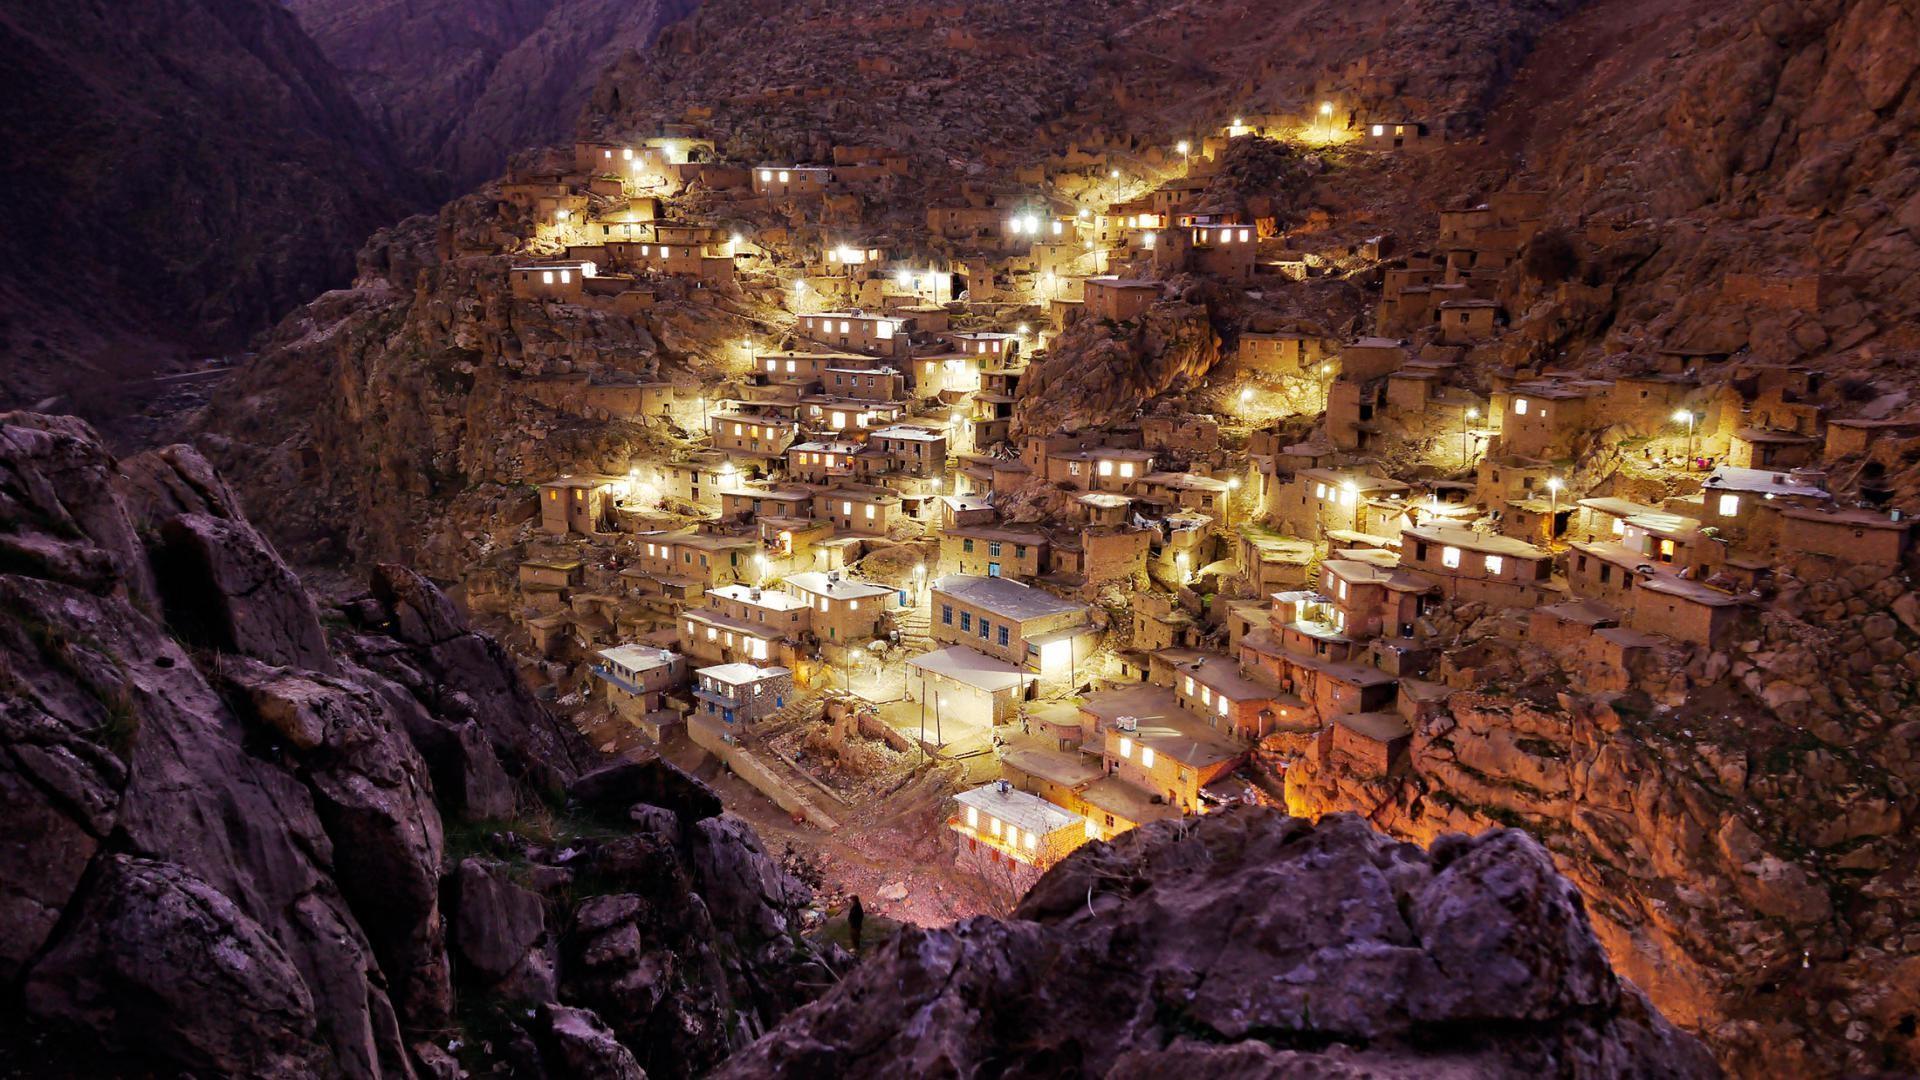 The most beautiful village in Iran - Then near-vertical Palangan village at night wallpaper